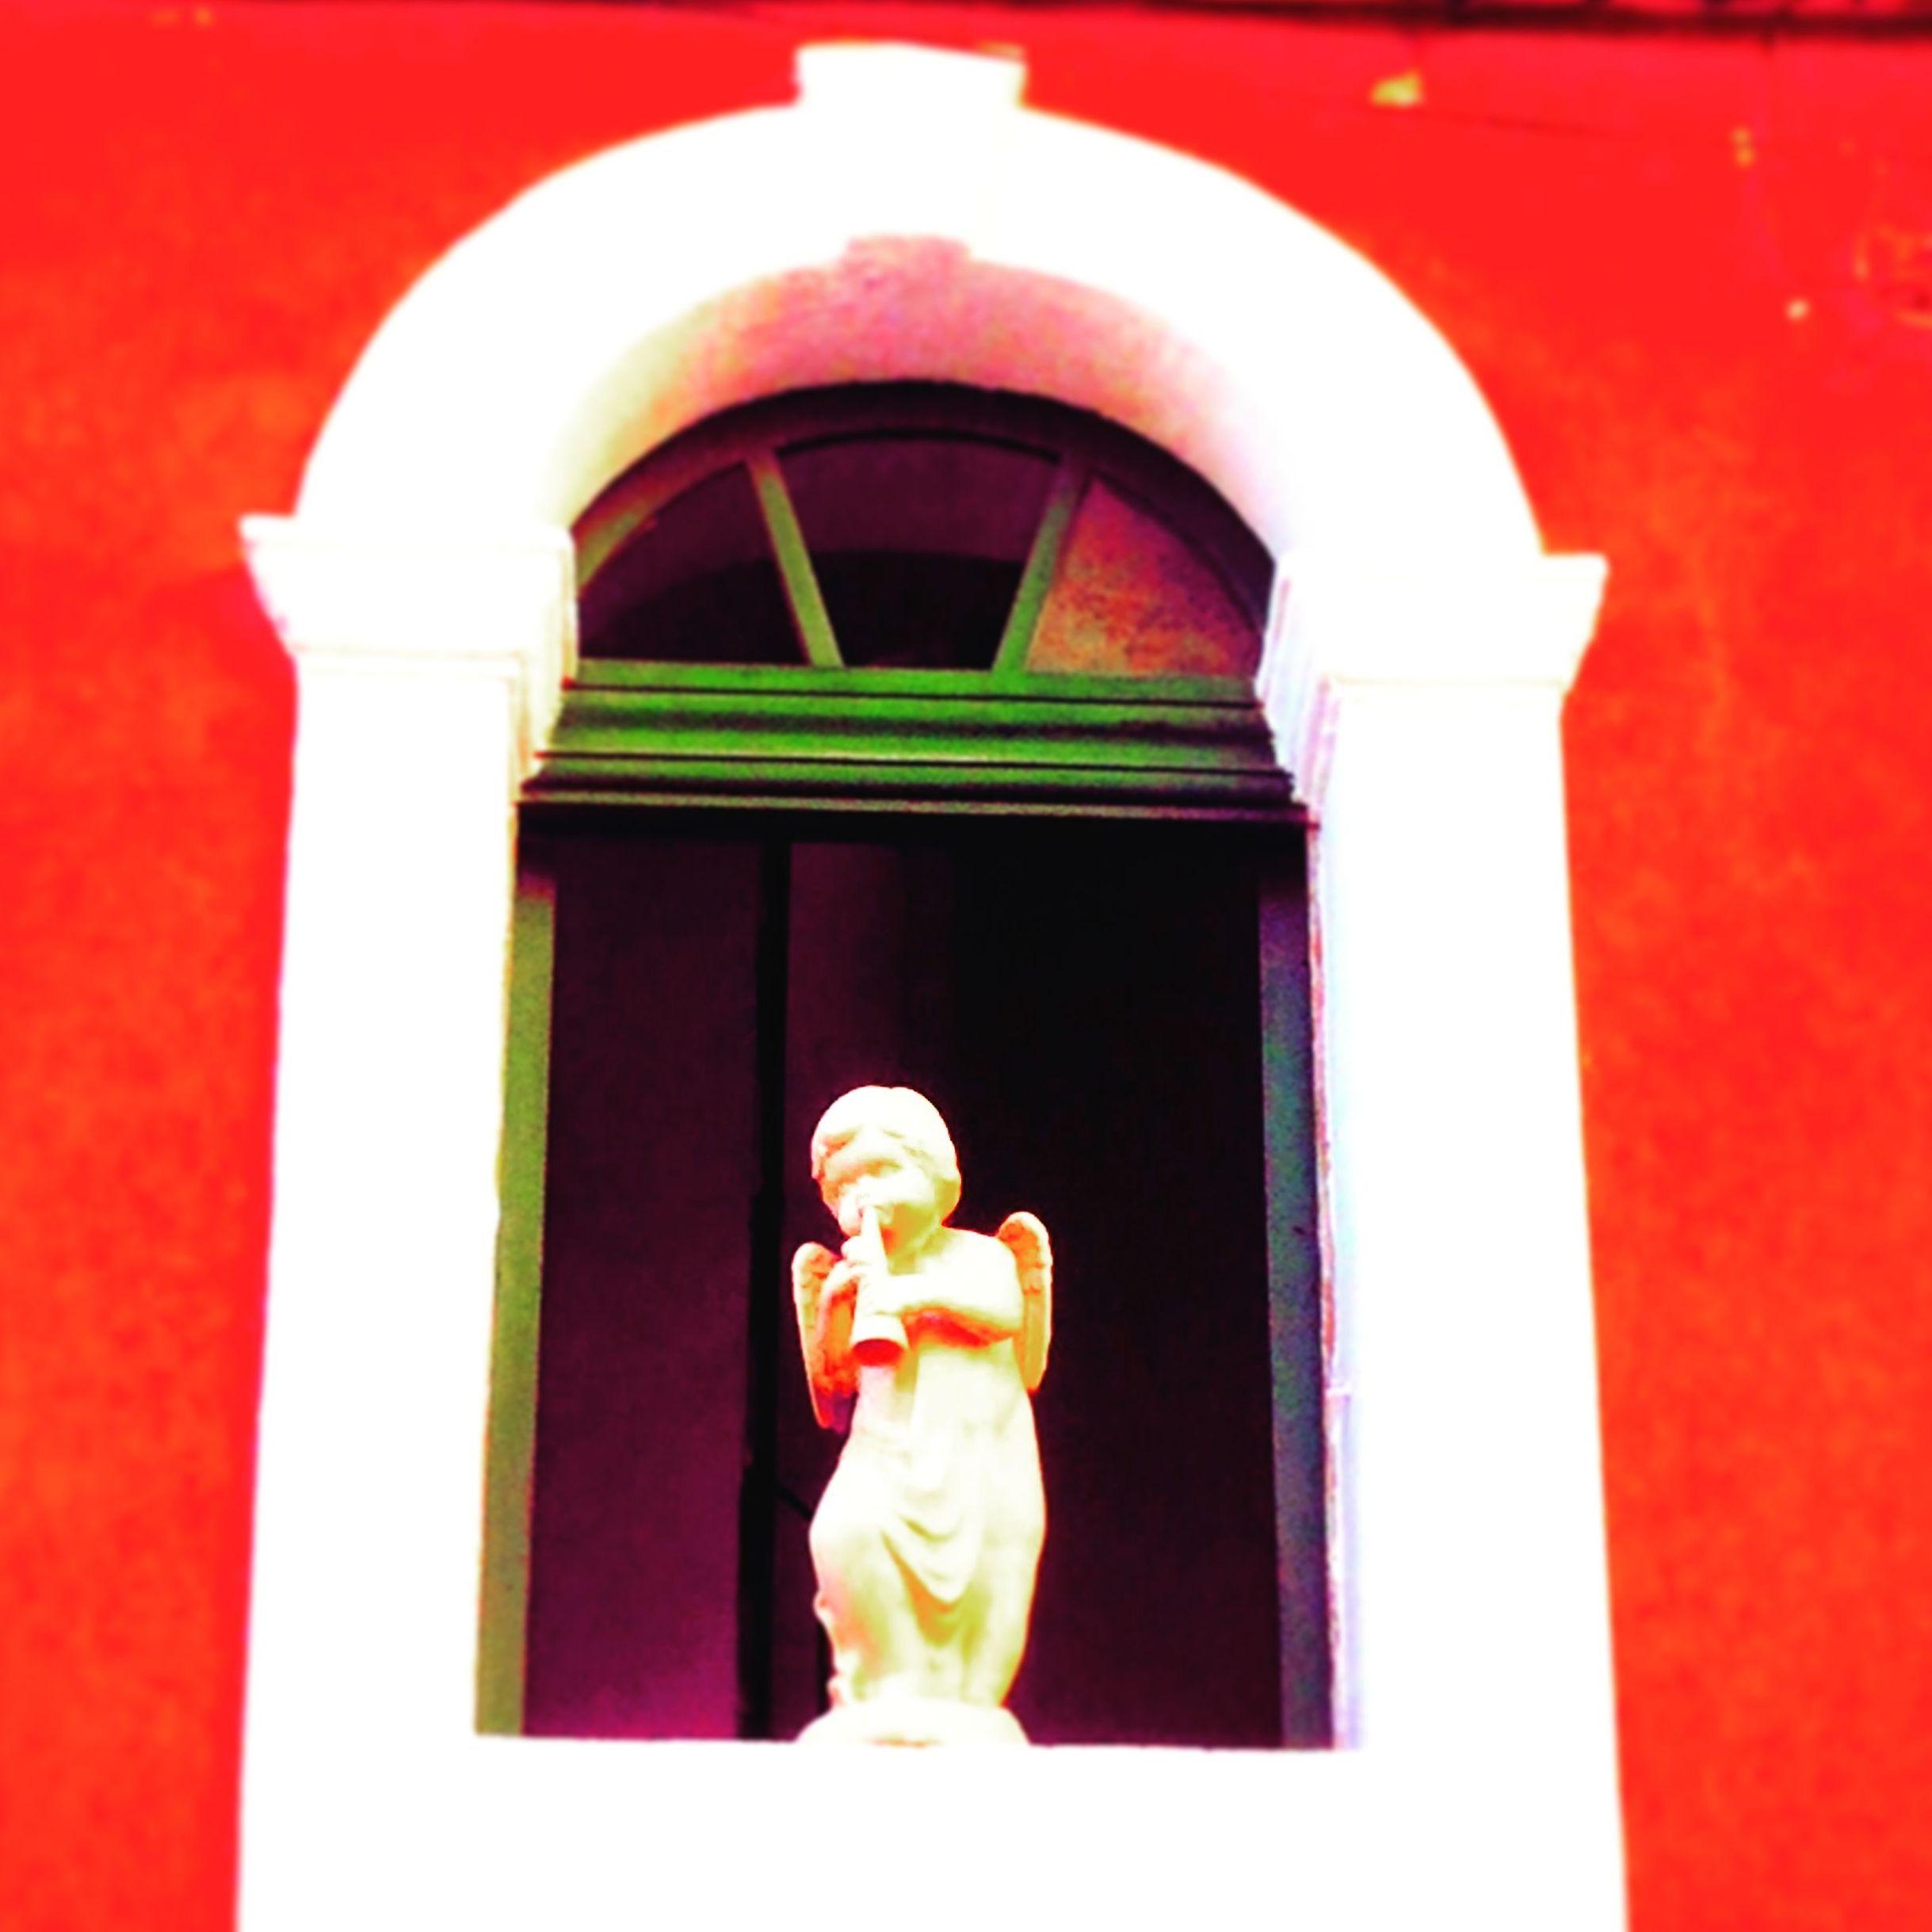 Foto 87 de Abogados en Eivissa | Raad Abogados. Tel 691 270 993